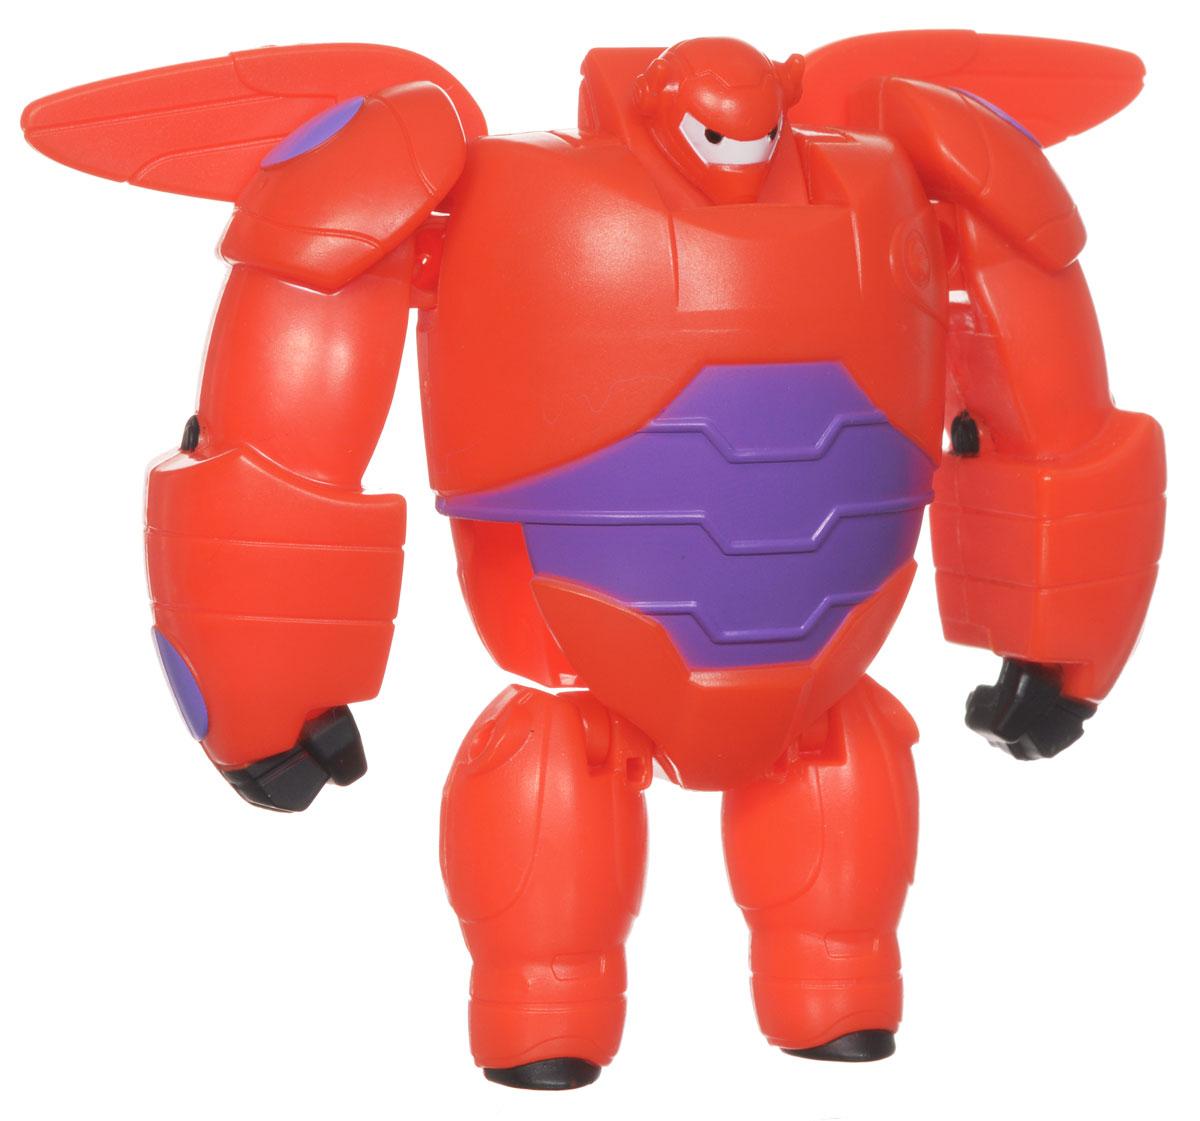 Игрушка EggStars Яйцо-трансформер: Бэймакс, цвет: красный роботы eggstars яйцо трансформер